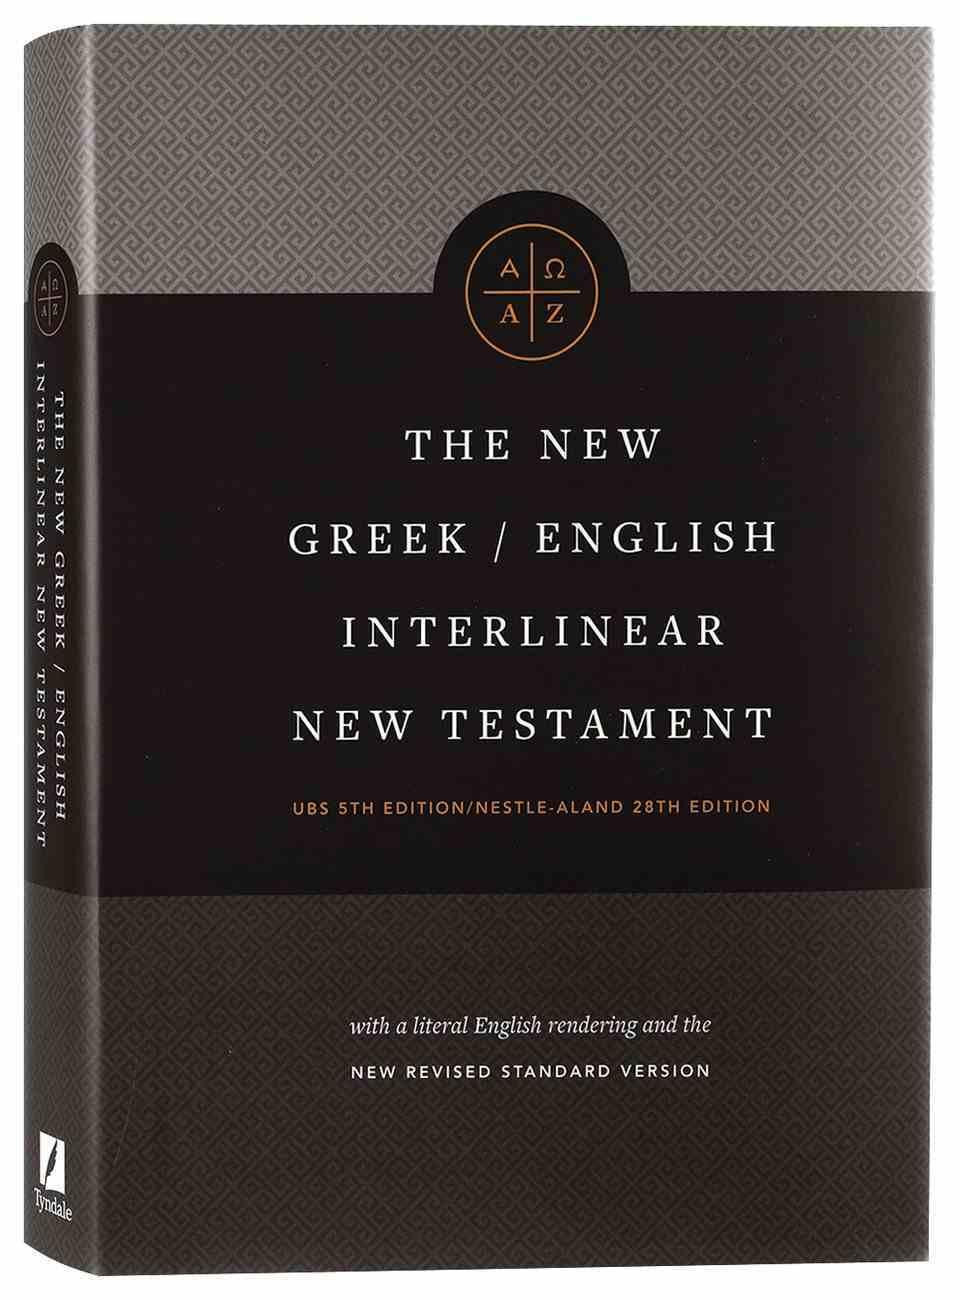 NRSV New Greek-English Interlinear New Testament Usb 5th + Nestle Aland 28Th Edition Hardback